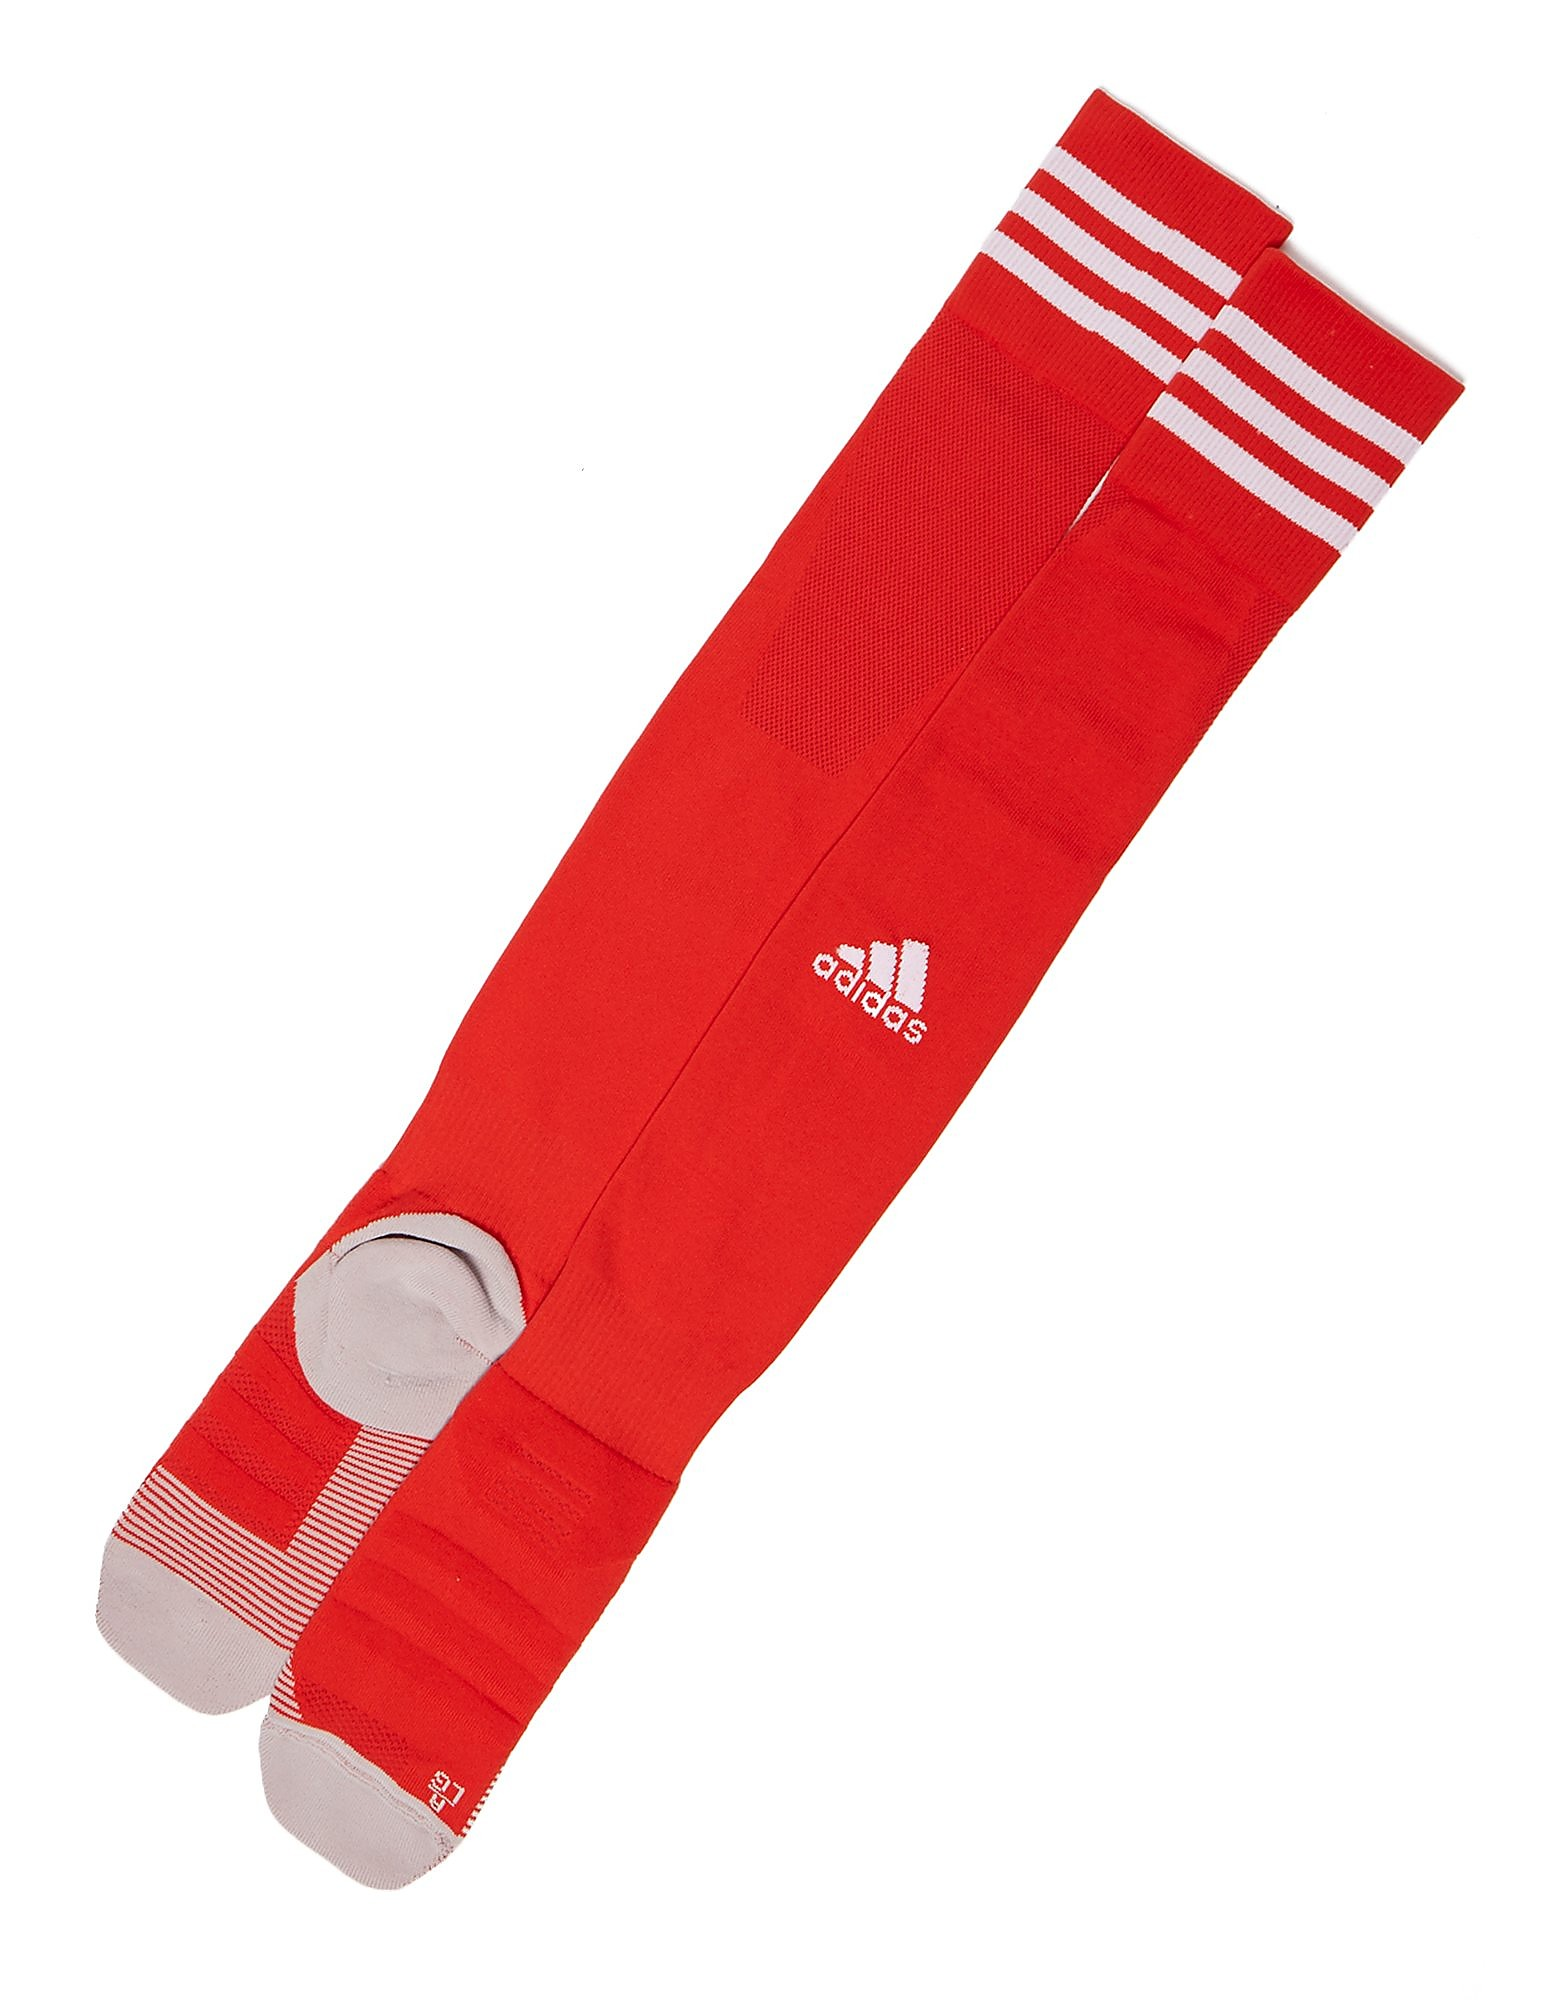 adidas Wales 2018/19 Home Socks - Rood - Heren